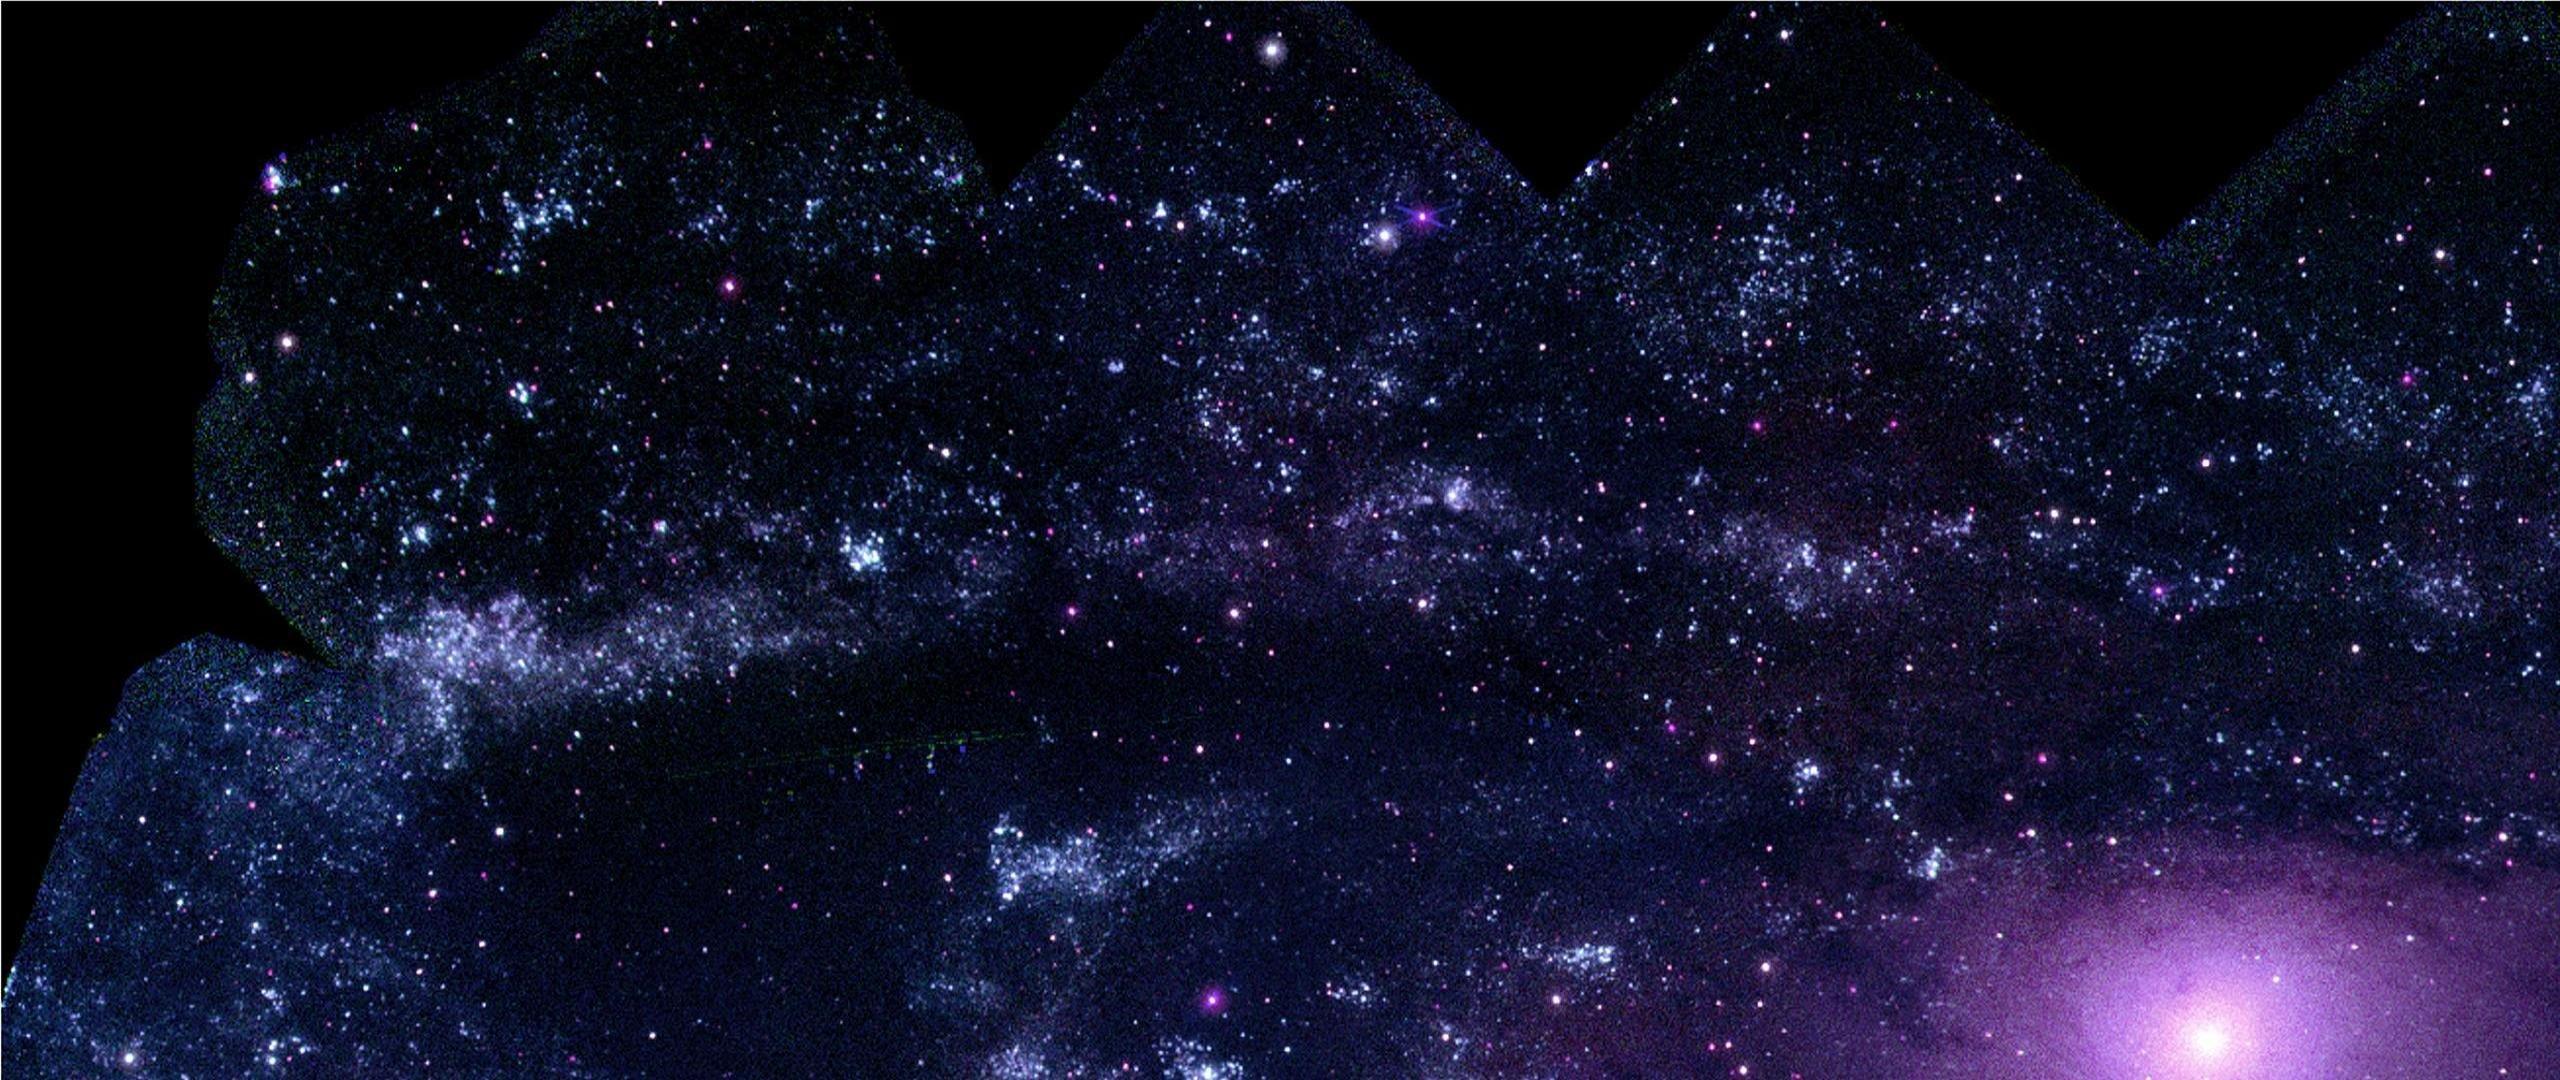 Galaxy Wallpapers High Resolution: Best Galaxy Wallpaper ID:443816 For High Resolution Hd